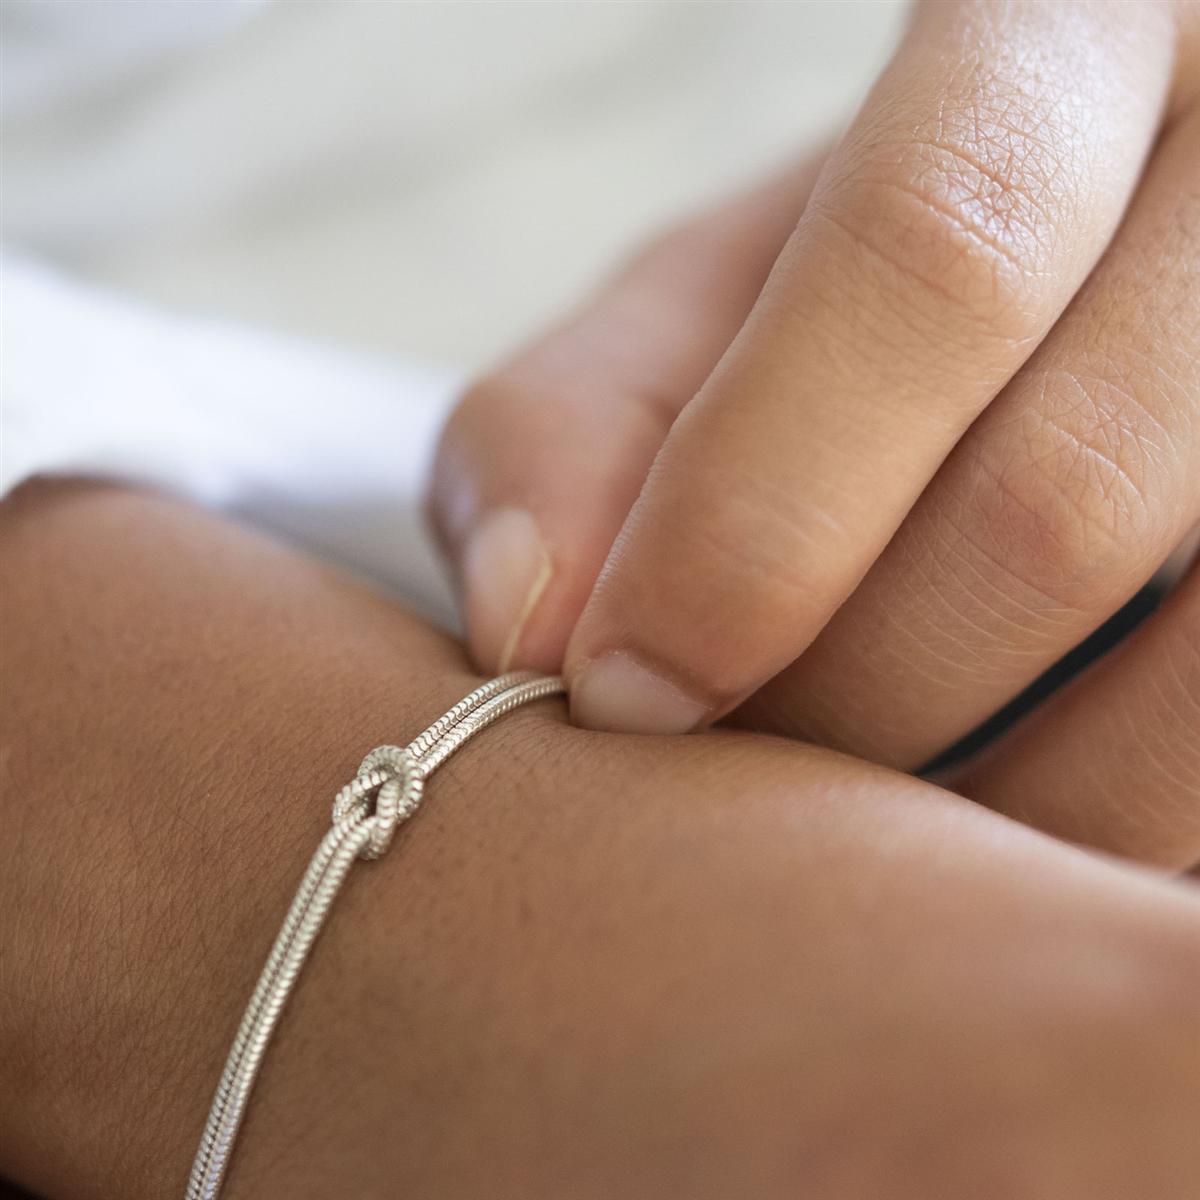 d7fbc88377f Tying The Knot Bracelet